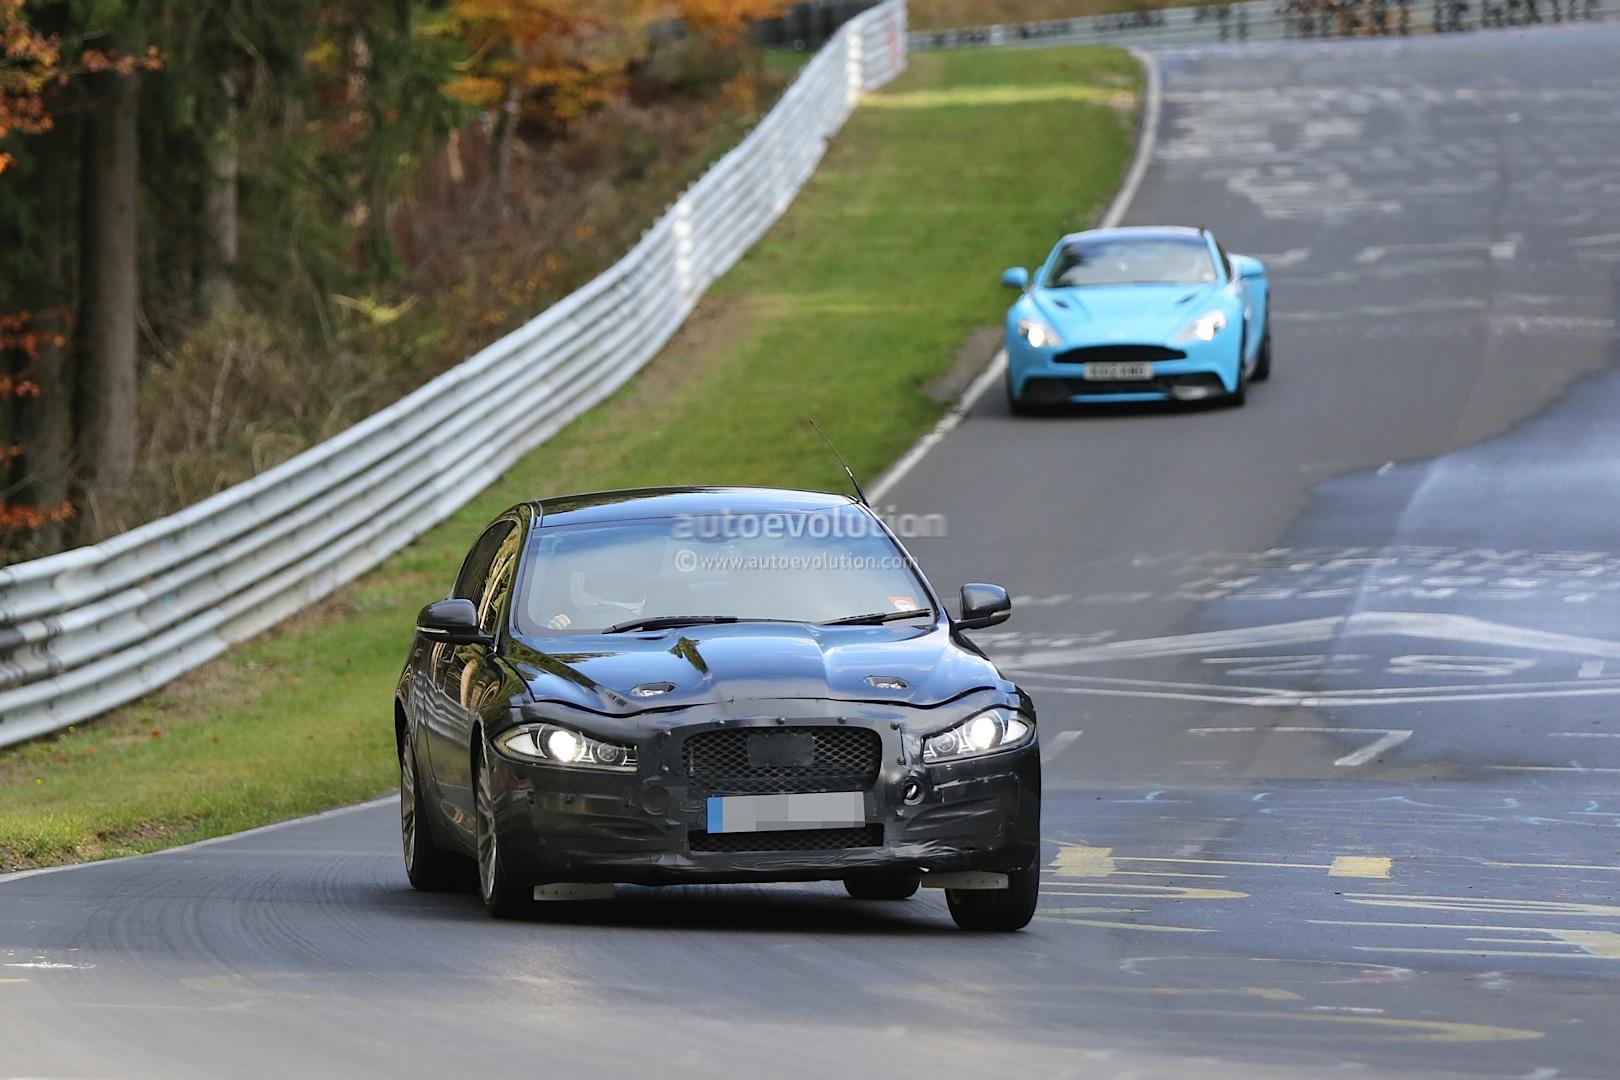 2016 Acura Ilx Premium 2015 2016 Cars News And Reviews | 2016 - 2017 ...